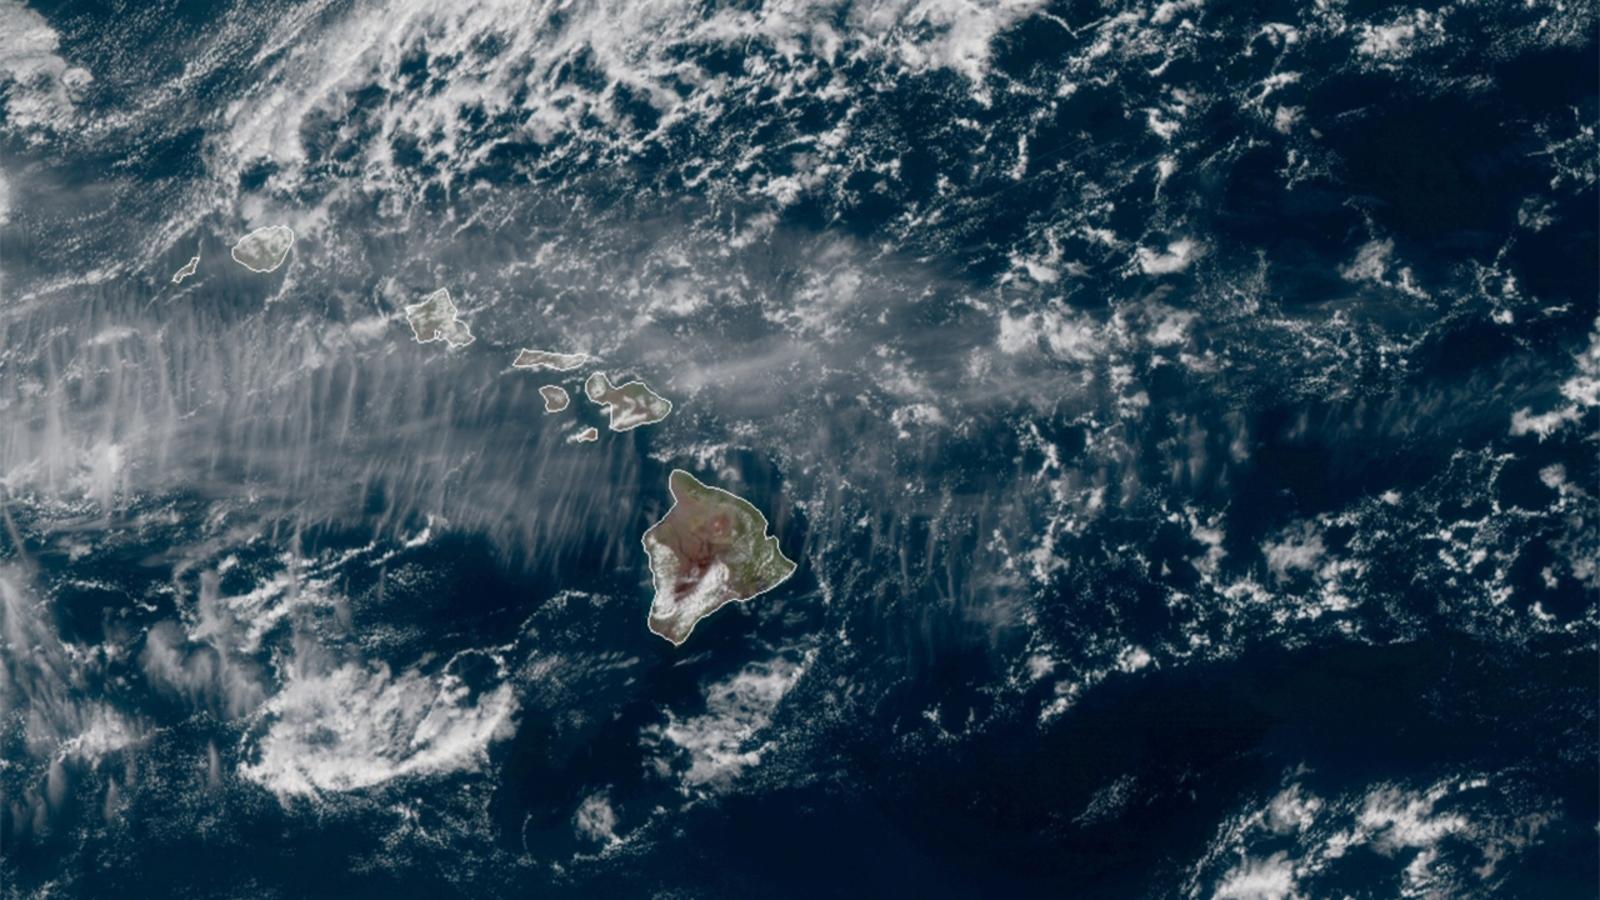 Tsunamis may strike Hawaii after huge earthquake off New Zealand: Agency